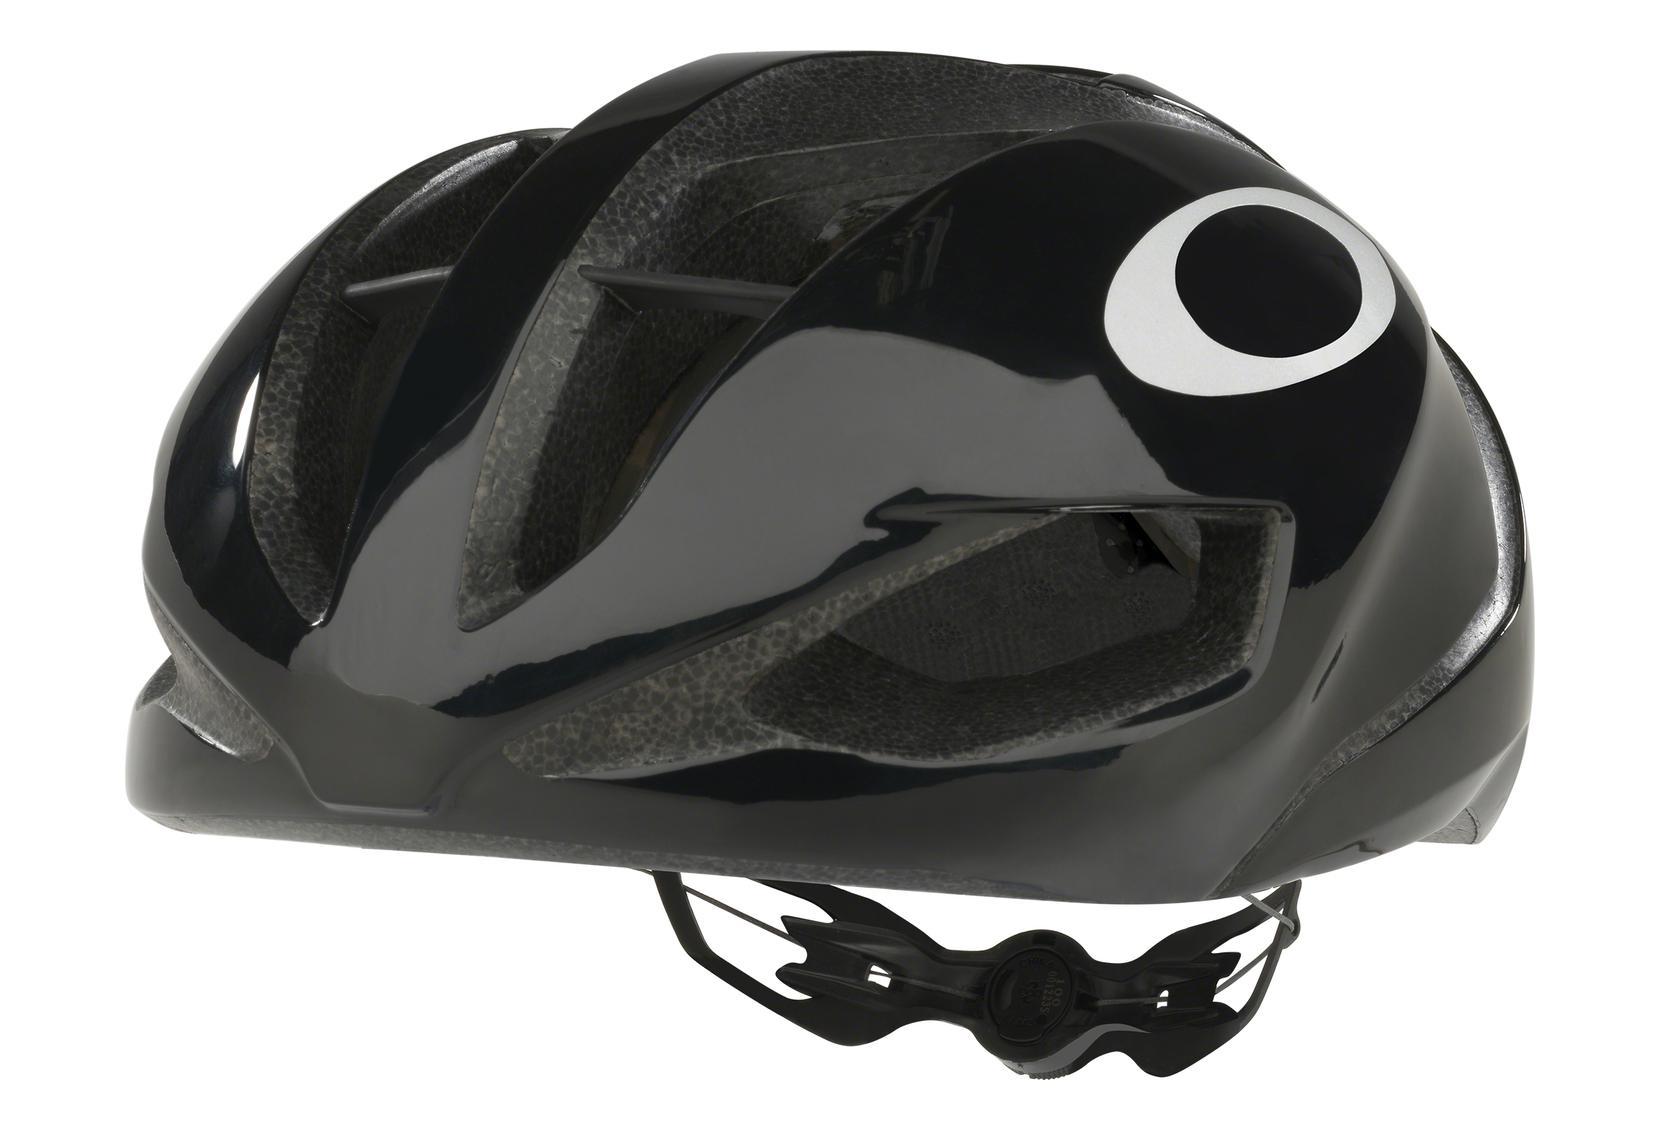 dd3f6d50c9 Oakley Aero Helmet ARO5 Mips Black